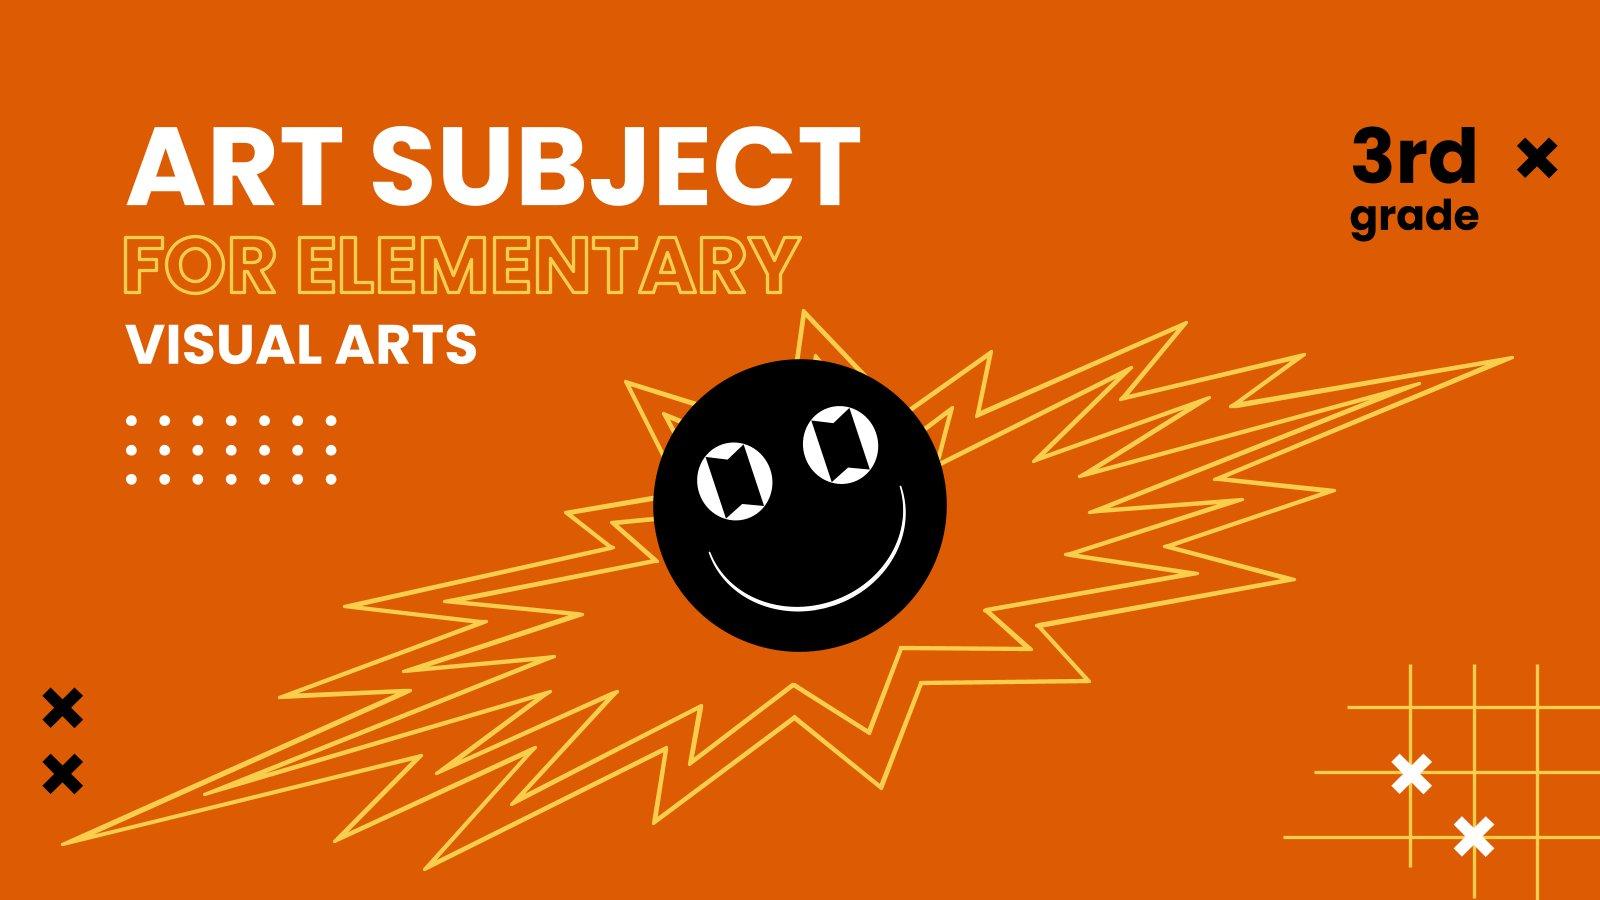 Art Subject for Elementary - 3rd Grade: Visual Arts presentation template